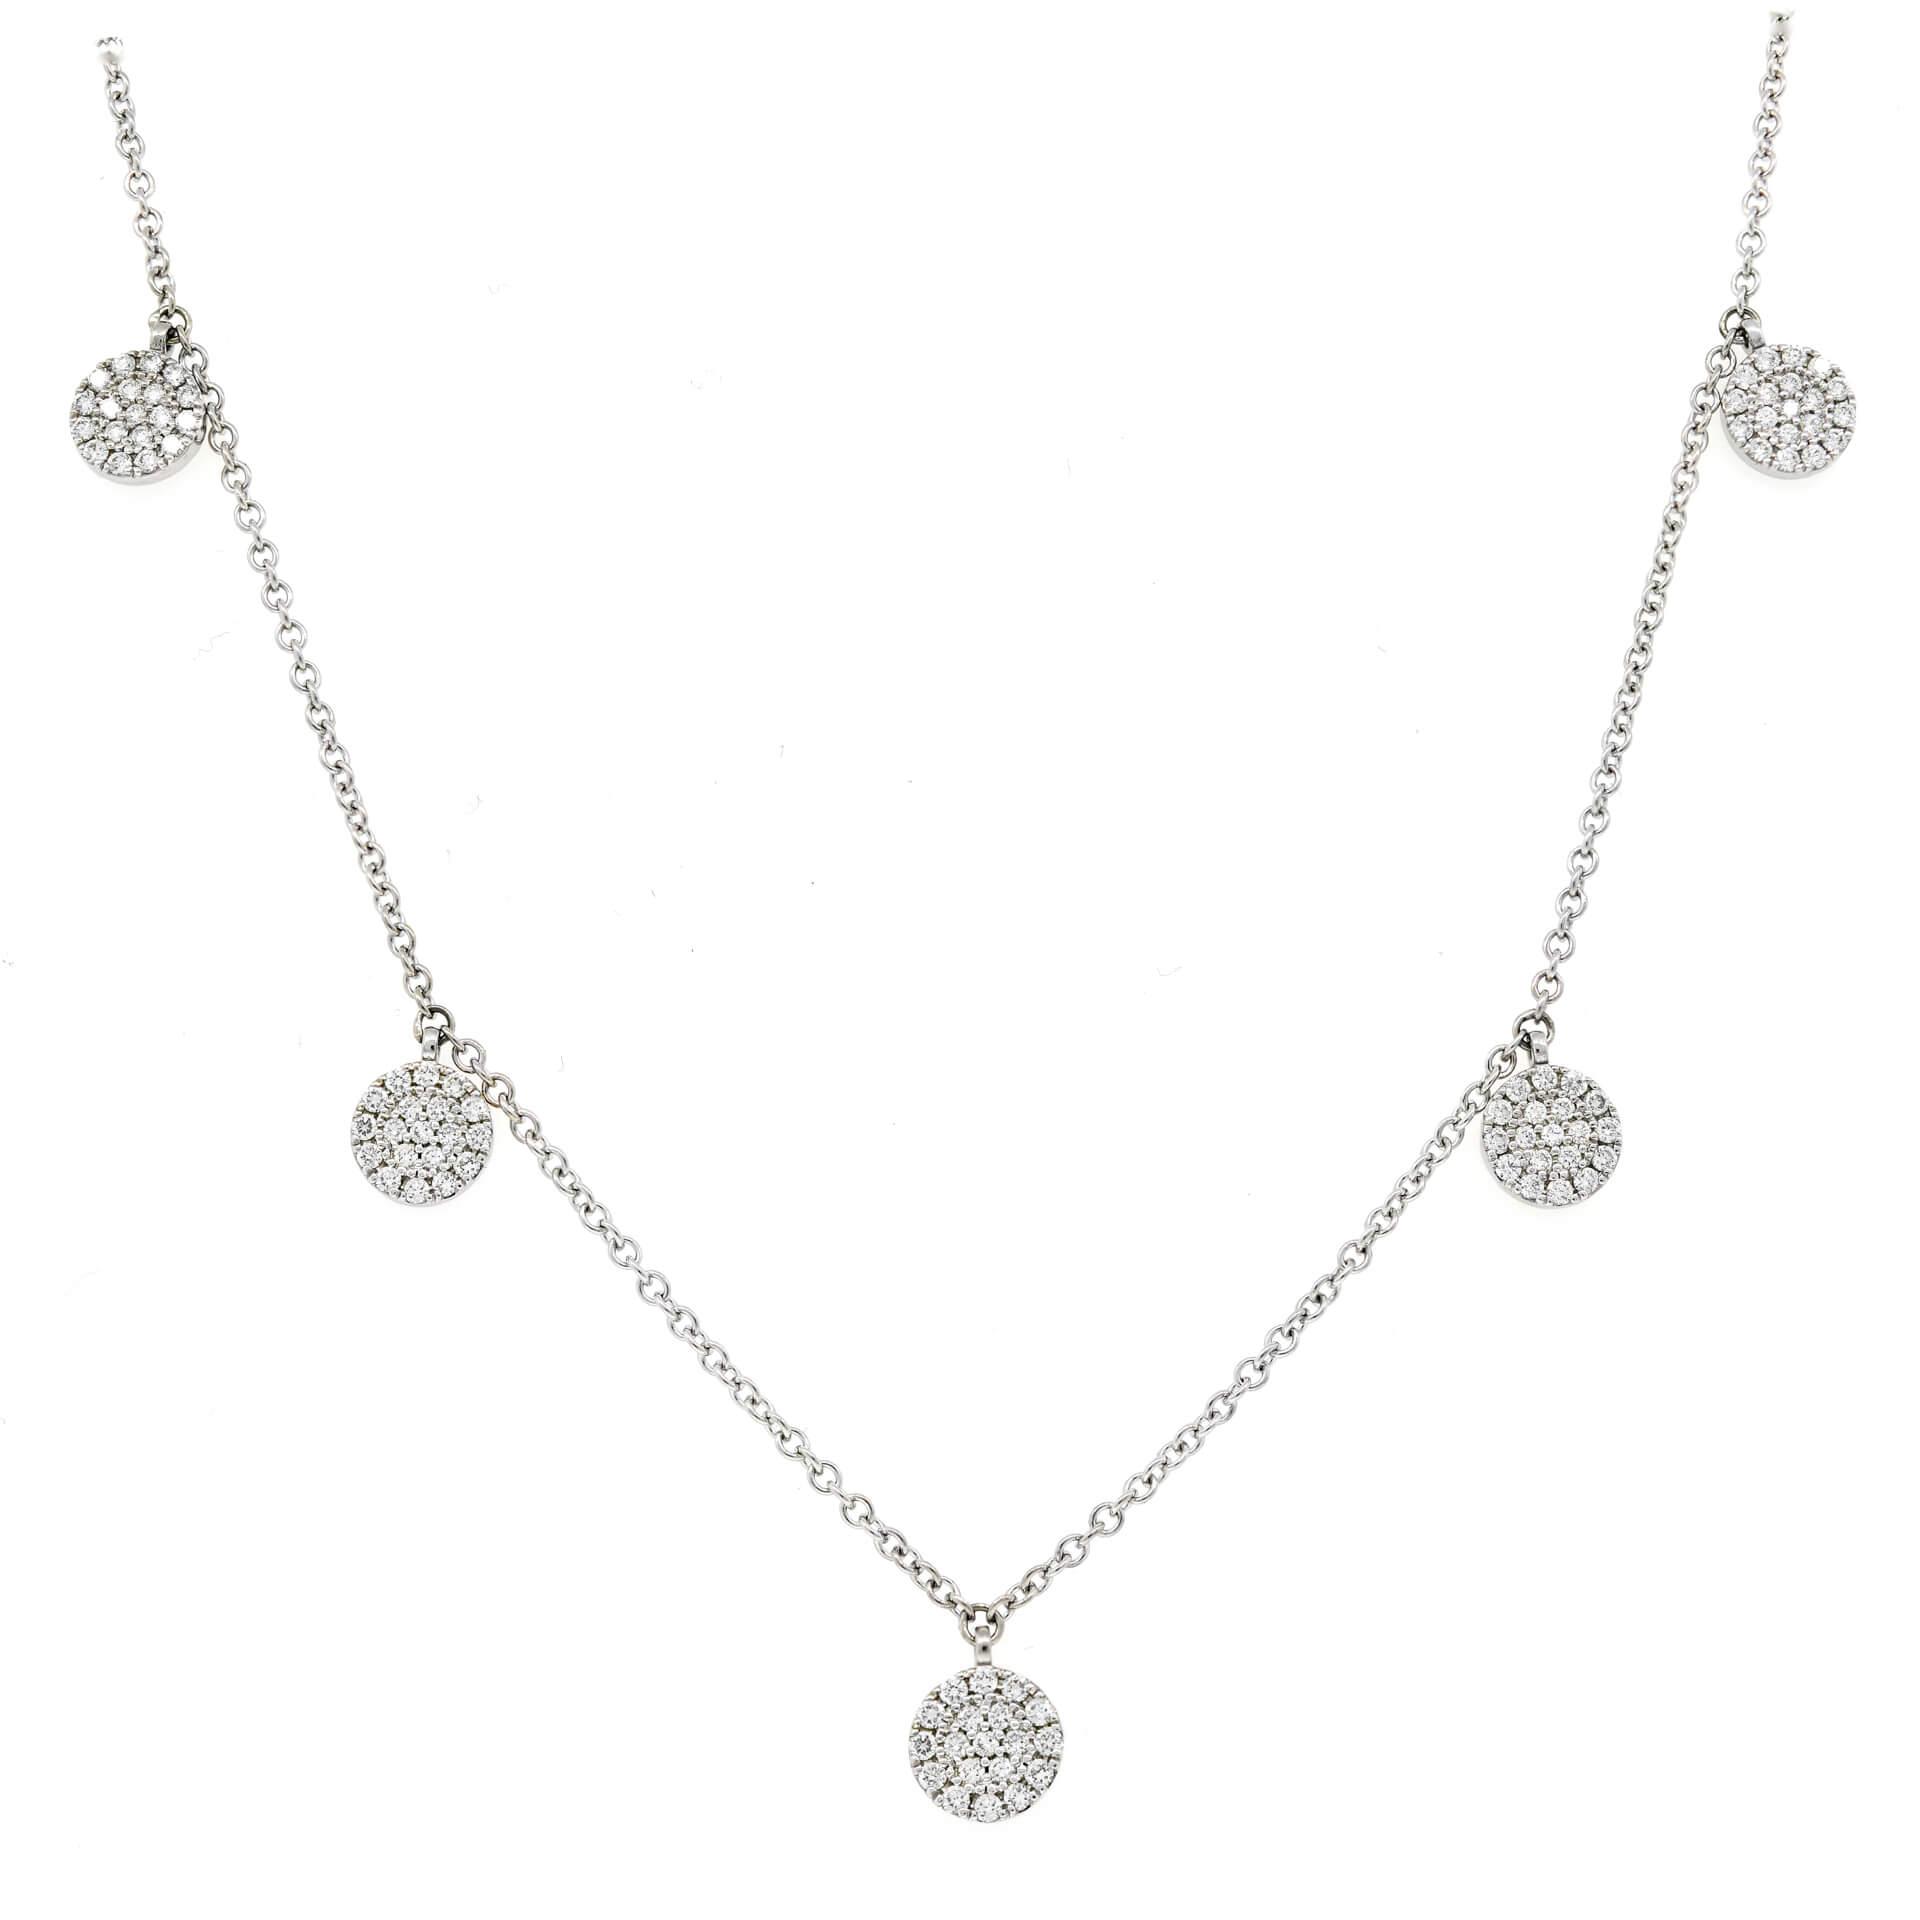 White Gold 5-Station Diamond Disk Necklace